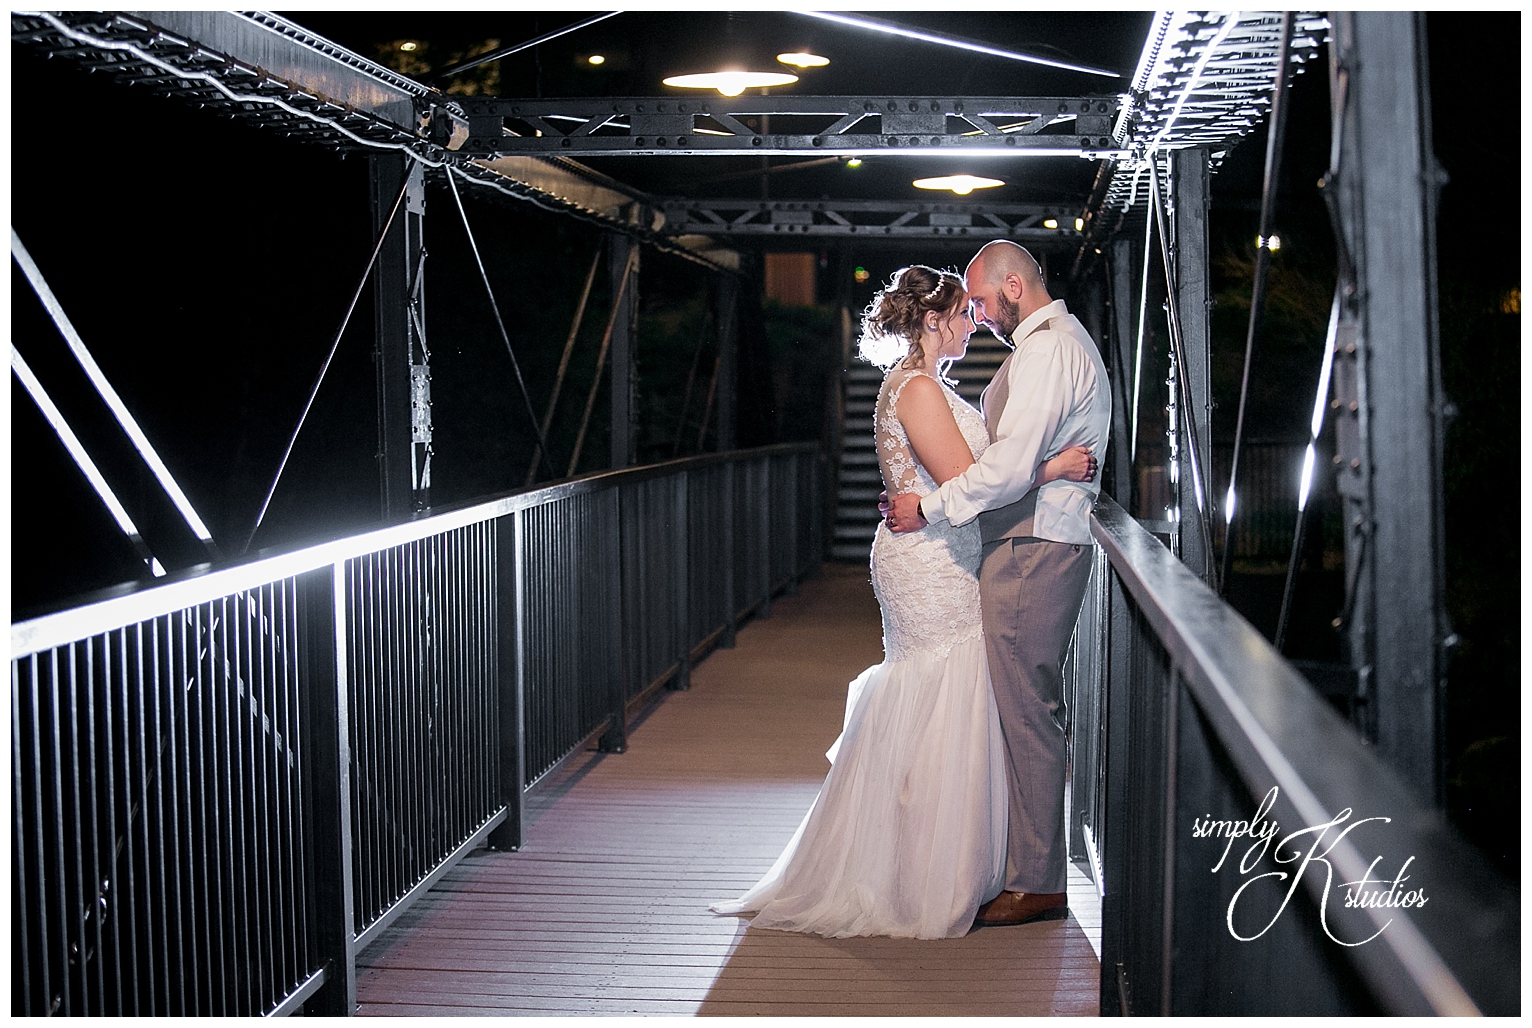 Silverthorne Pavilion Wedding Photography.jpg